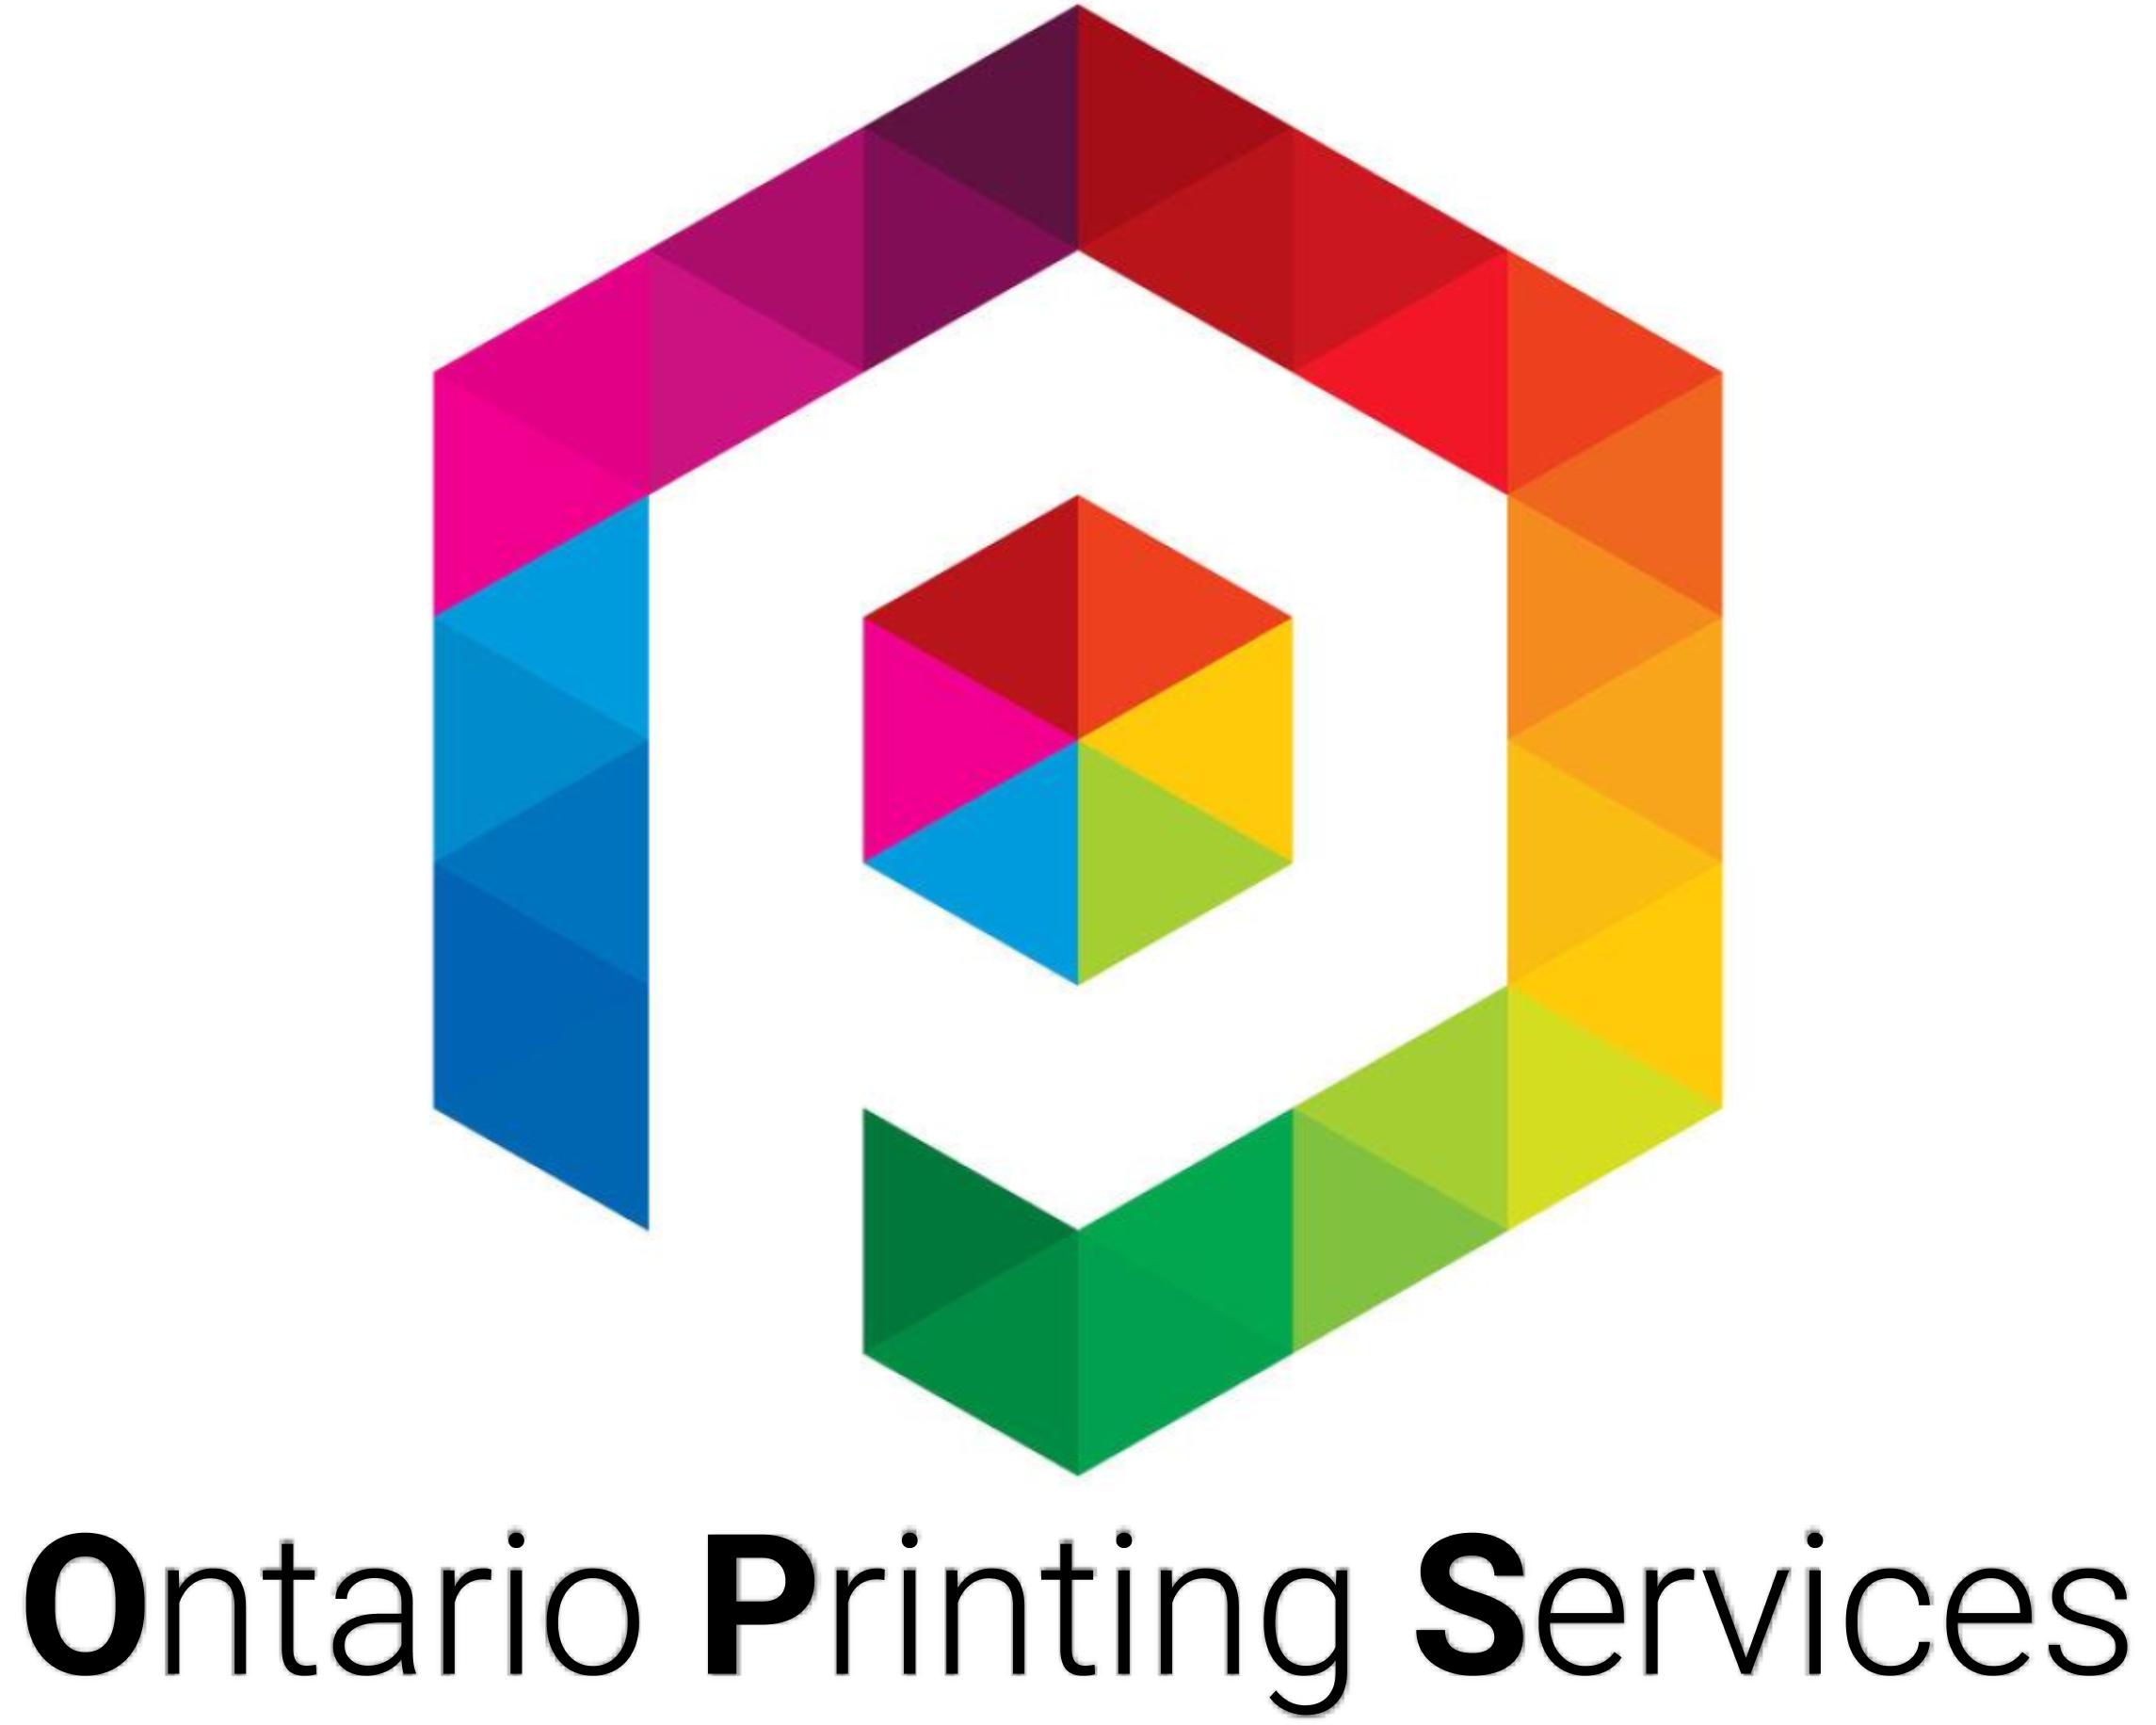 Ontario Printing Services